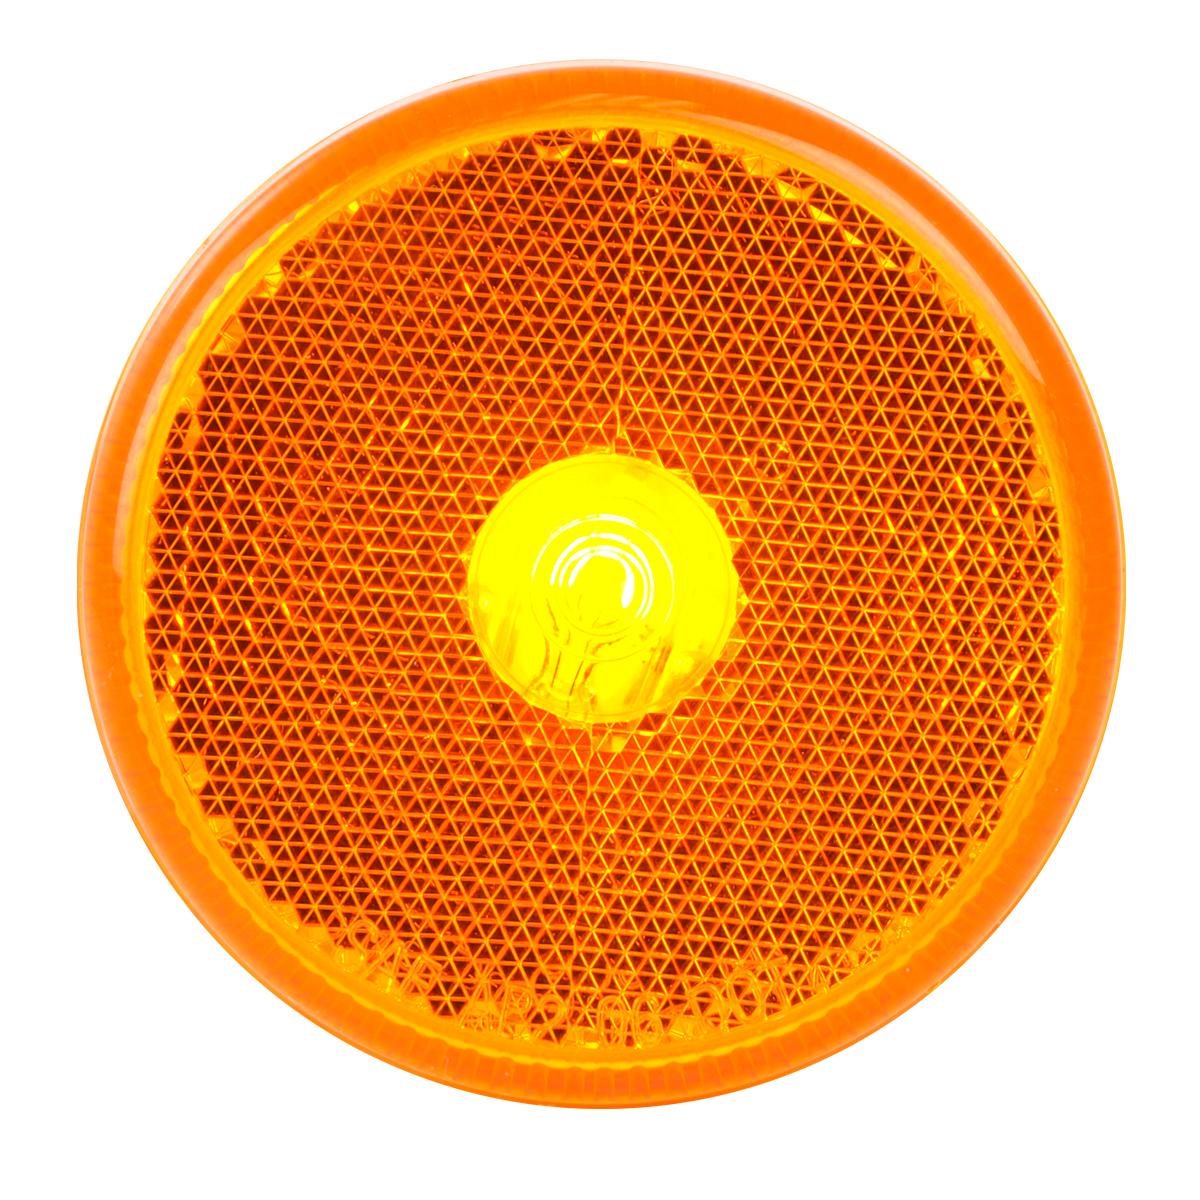 "#80713 2 ½"" Incandescent Flat Amber/Amber Light"